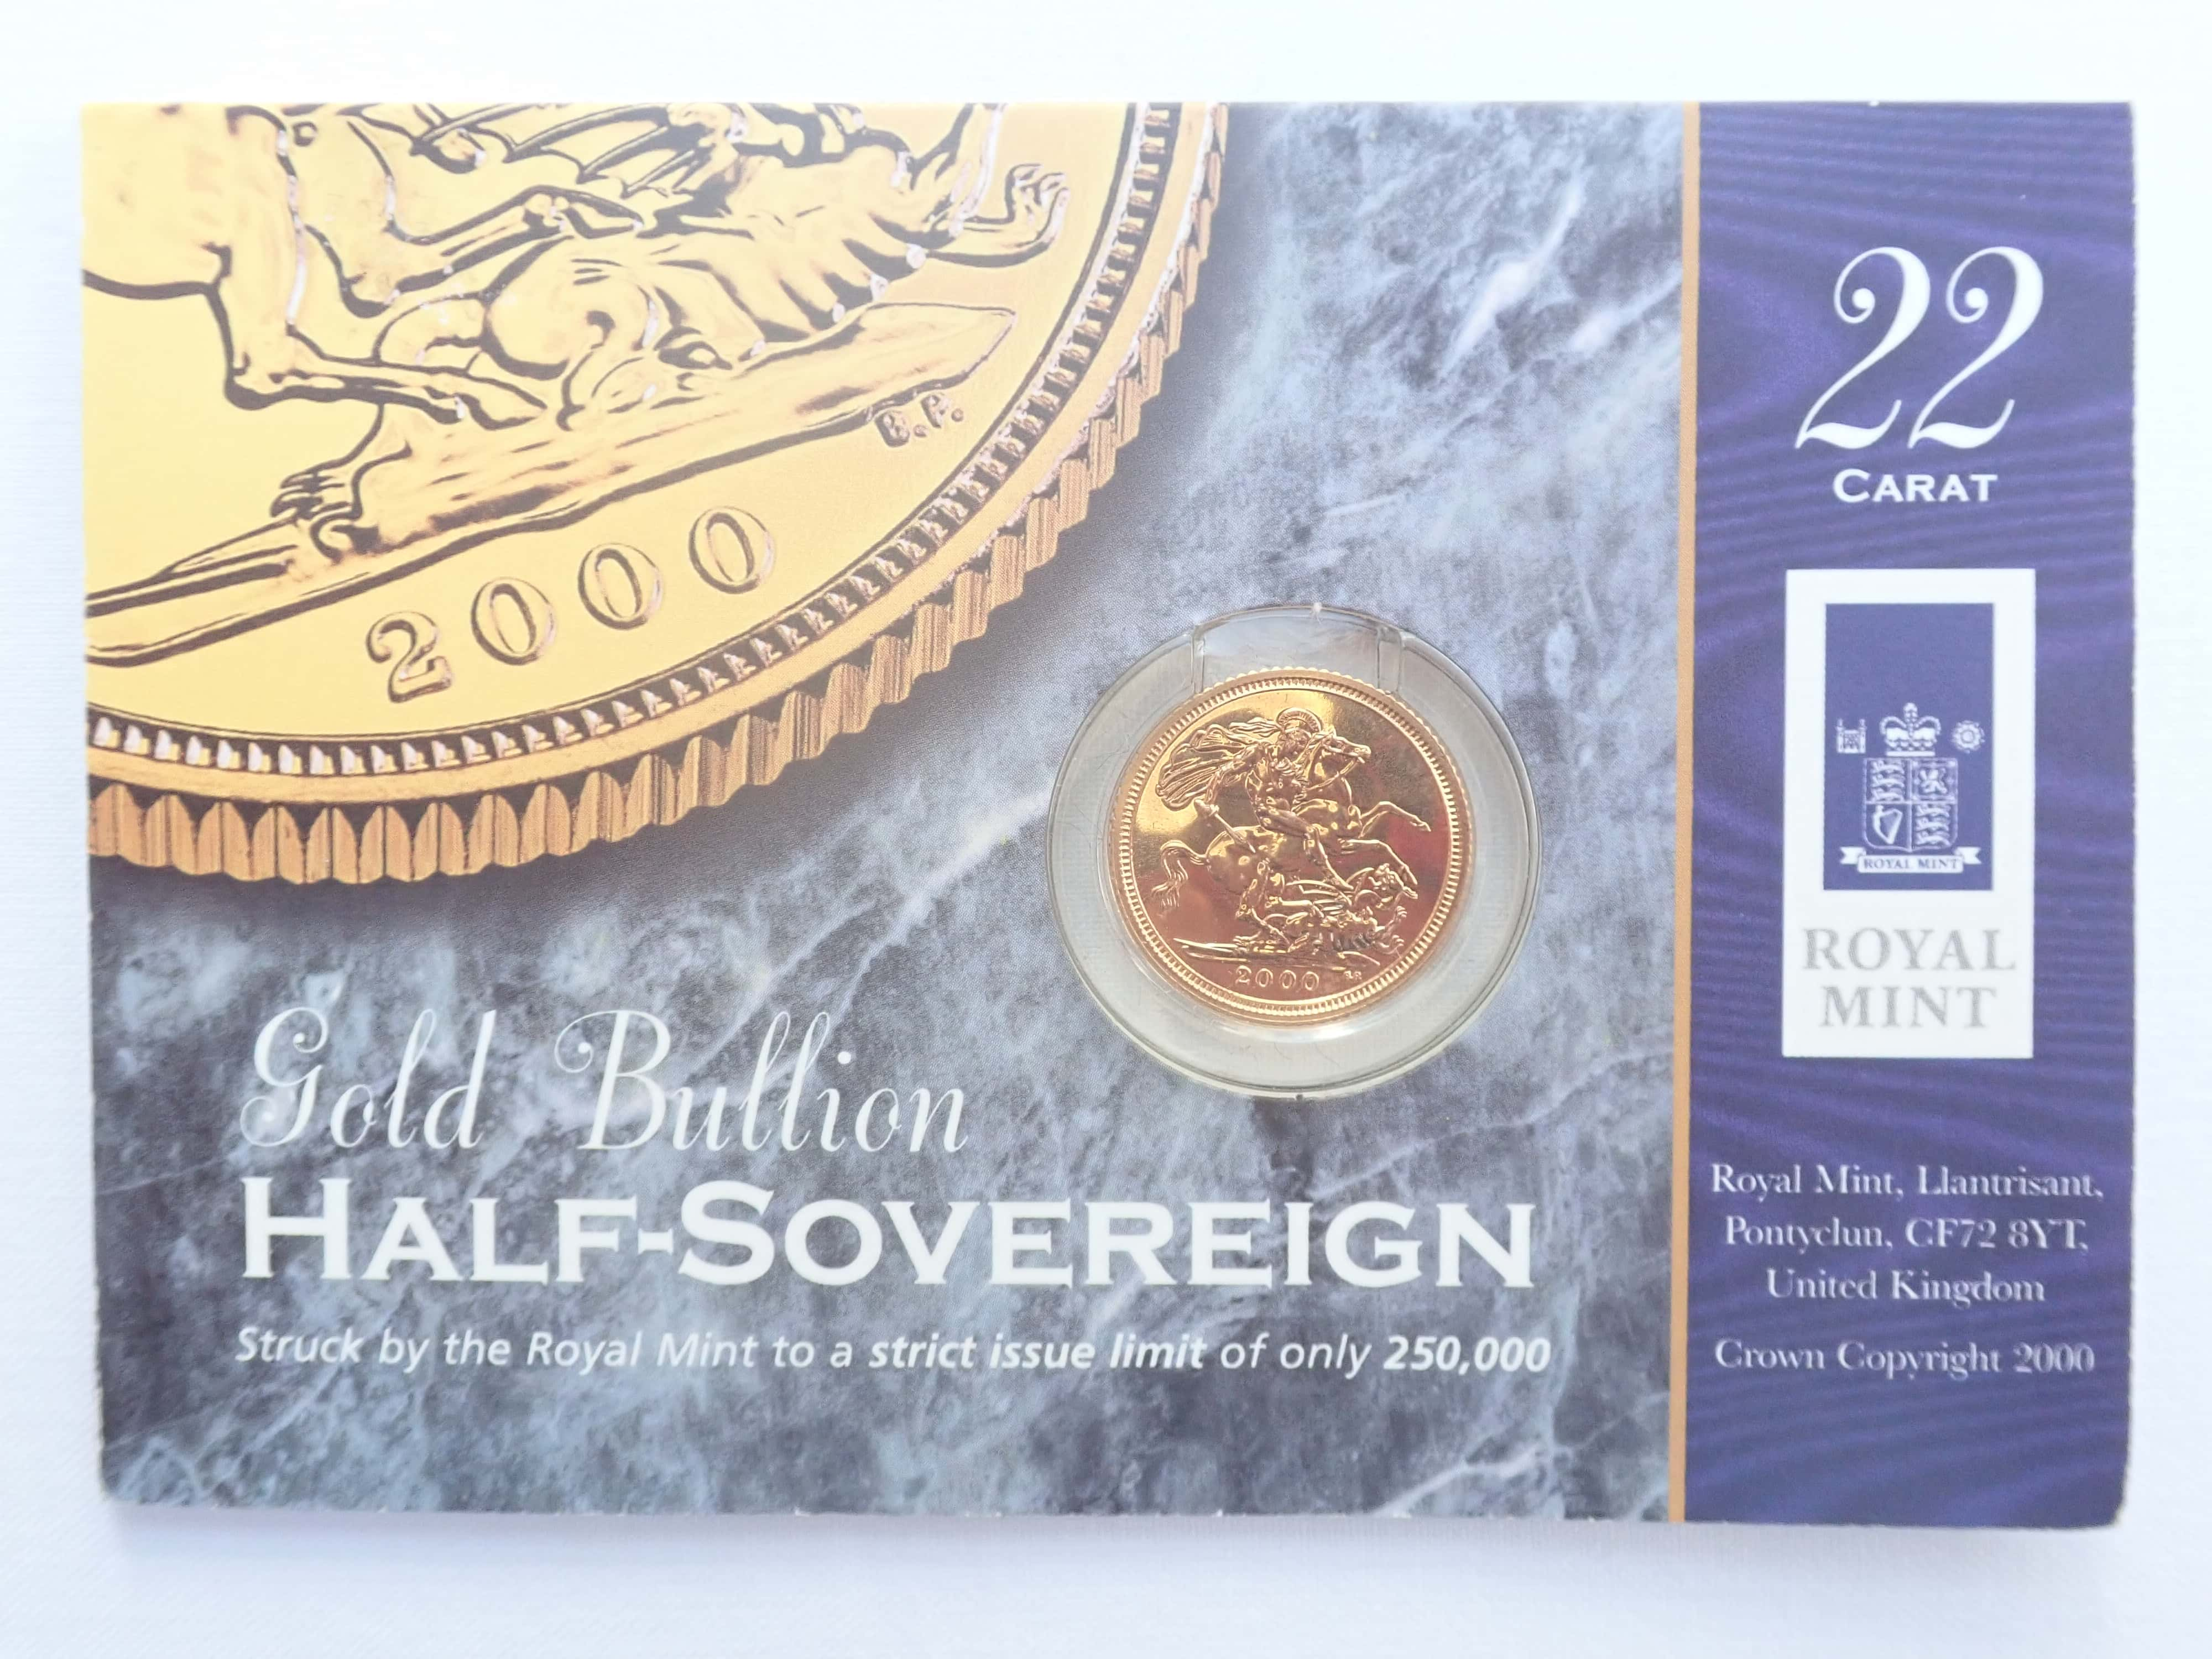 AA000737 - 2000 Proof Gold Half Sovereign 22k Elizabeth II 4th Portrait #175